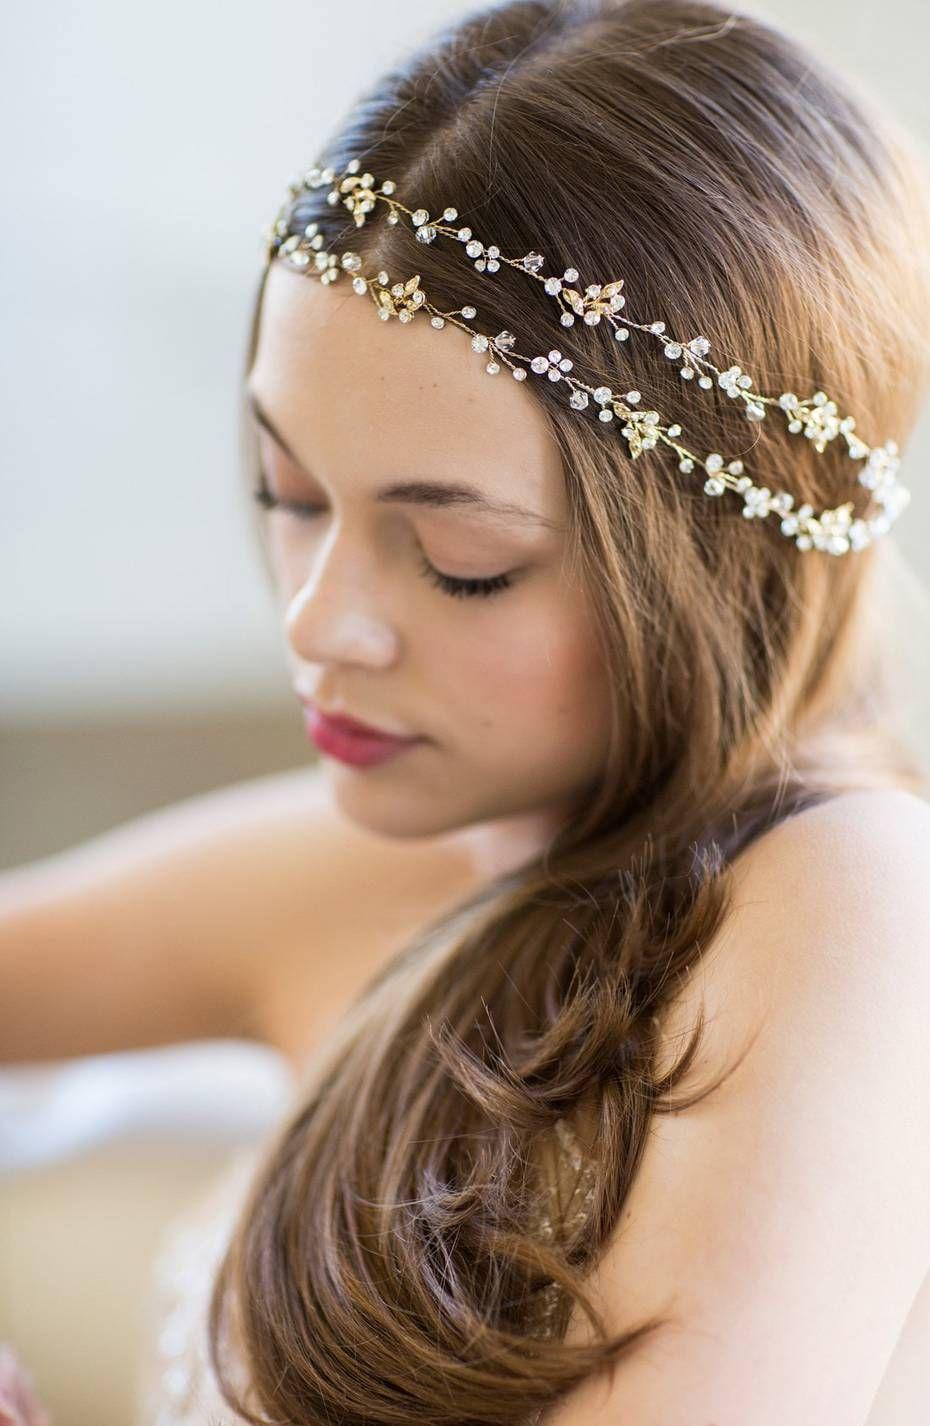 20 beautiful bridal headbands to create your princess-worthy